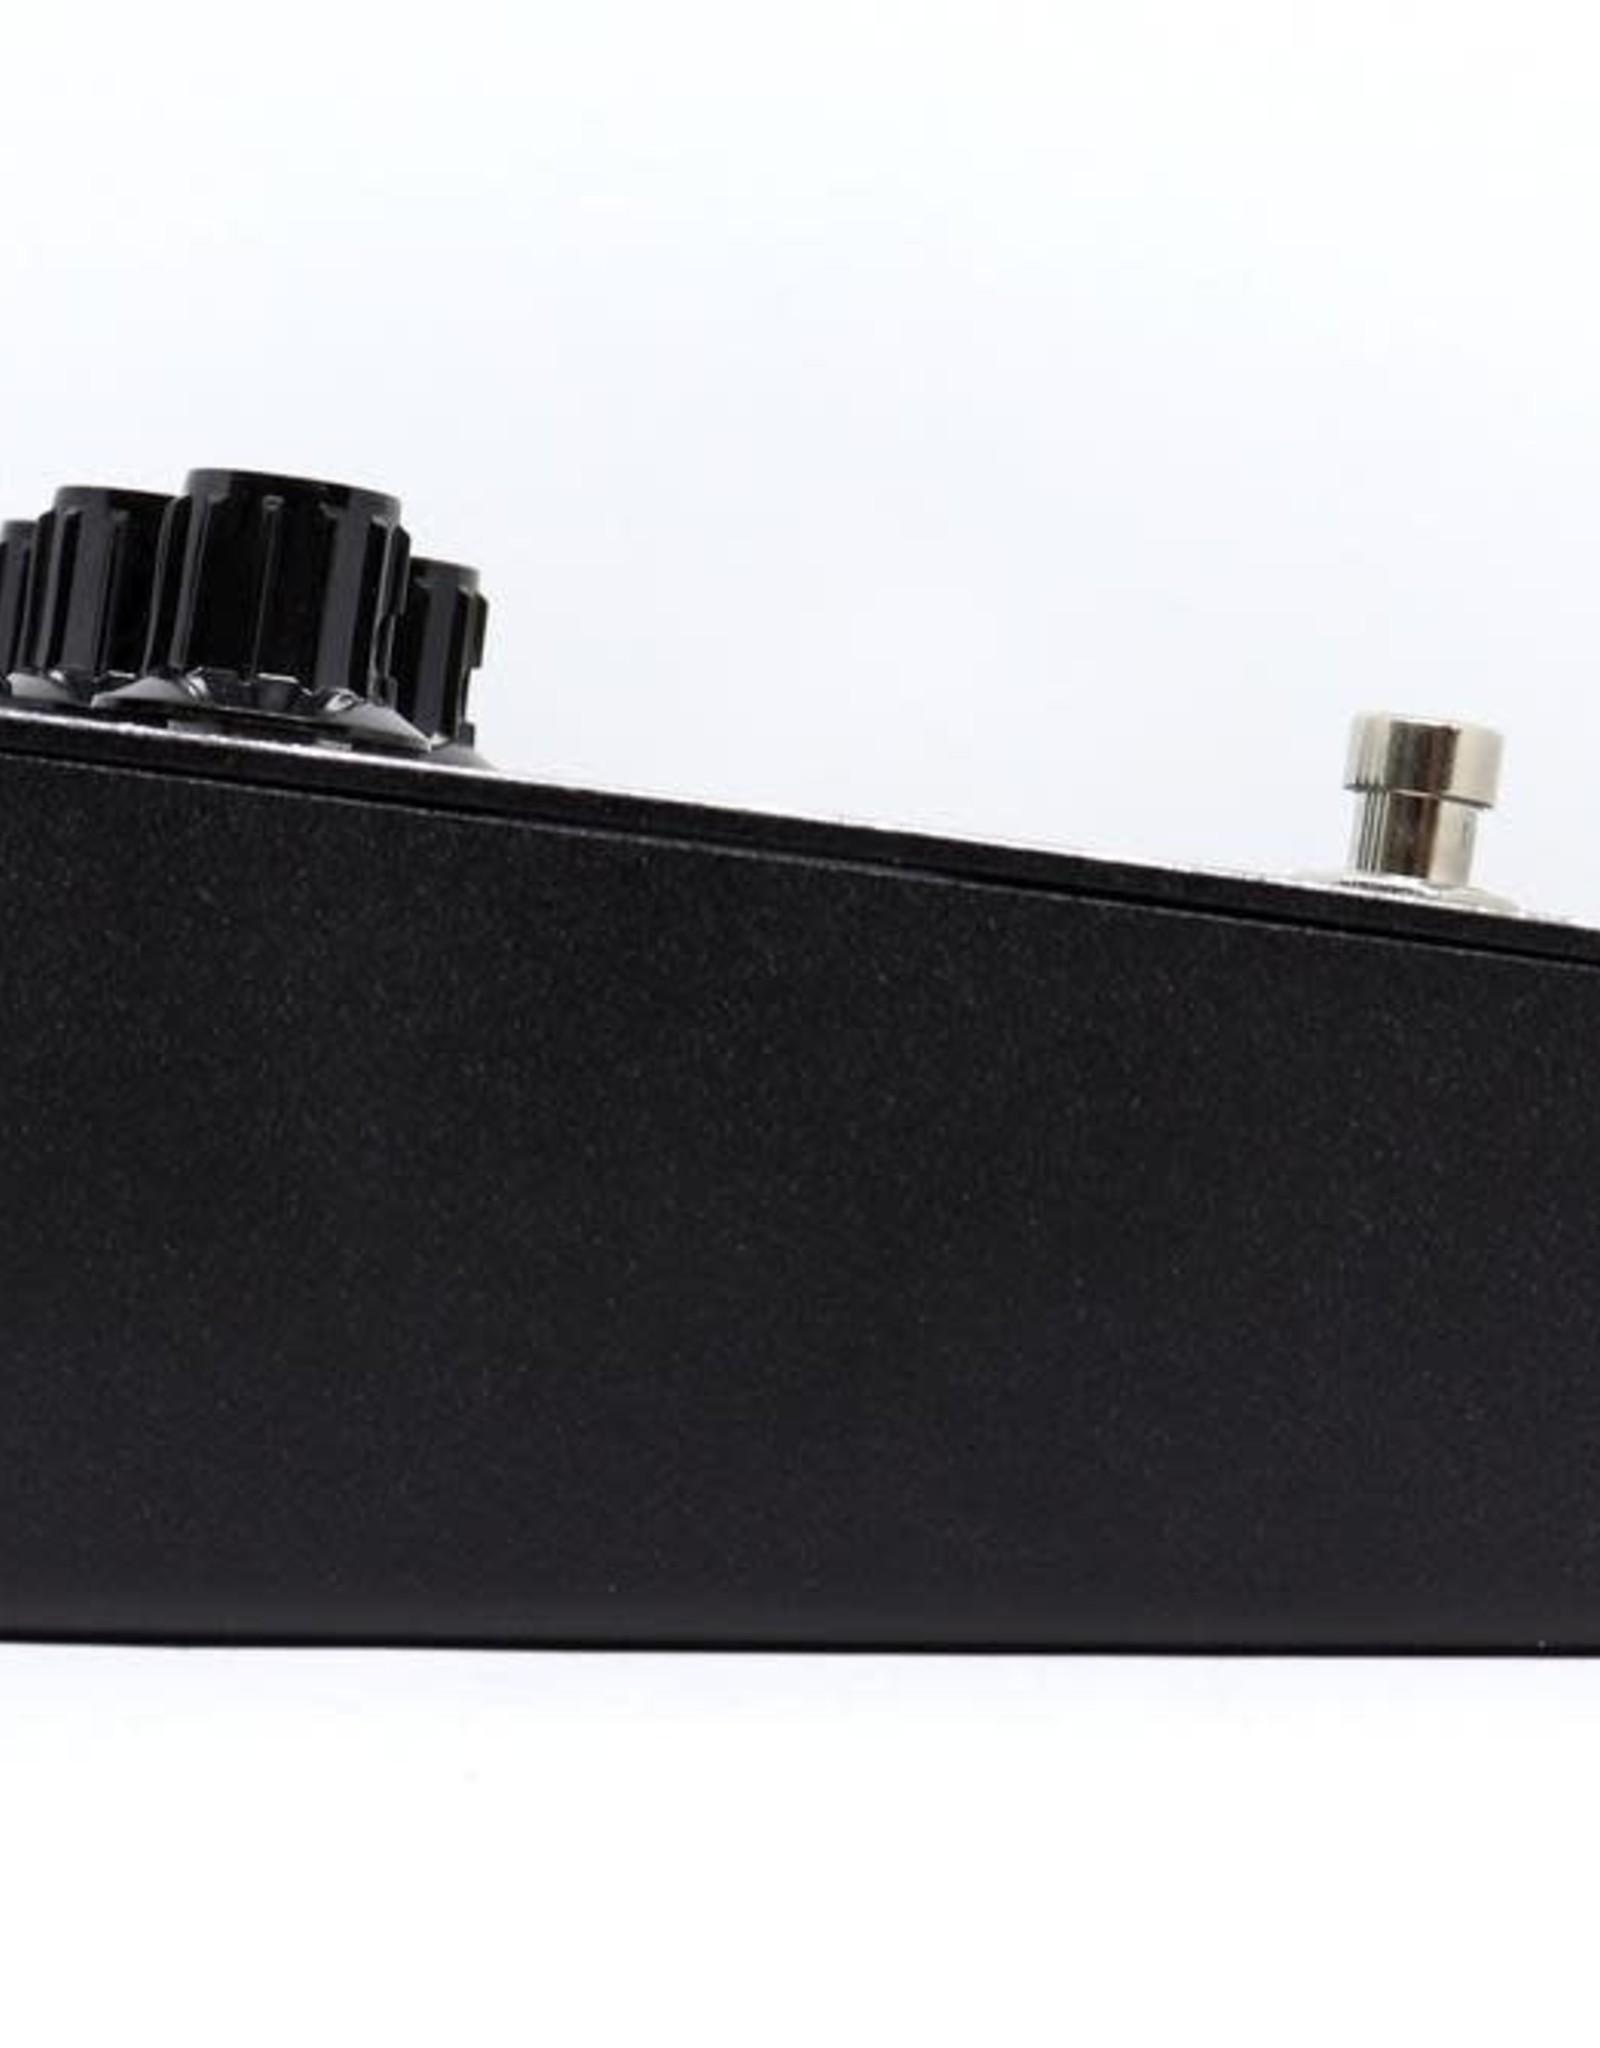 Gamechanger Audio Gamechanger Audio PLASMA Pedal